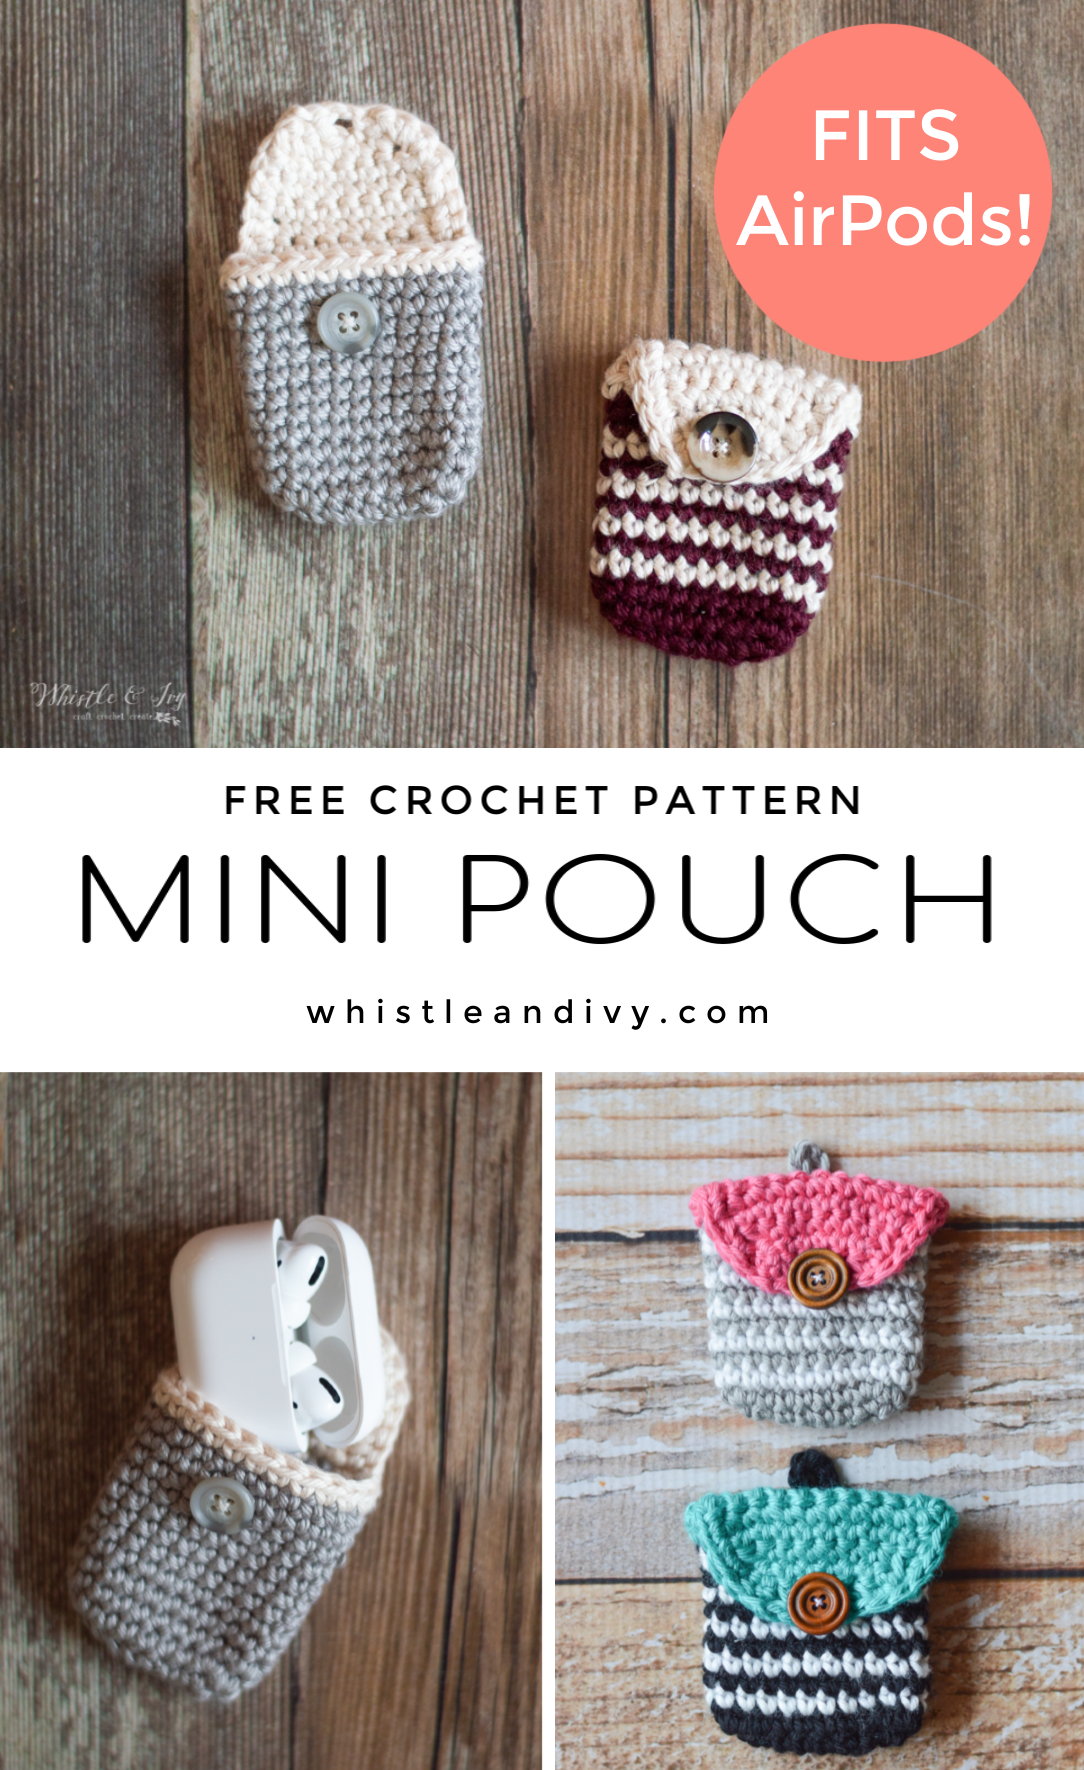 Crochet Coin Pouch/Crochet AirPods Pouch – Free Crochet Pattern